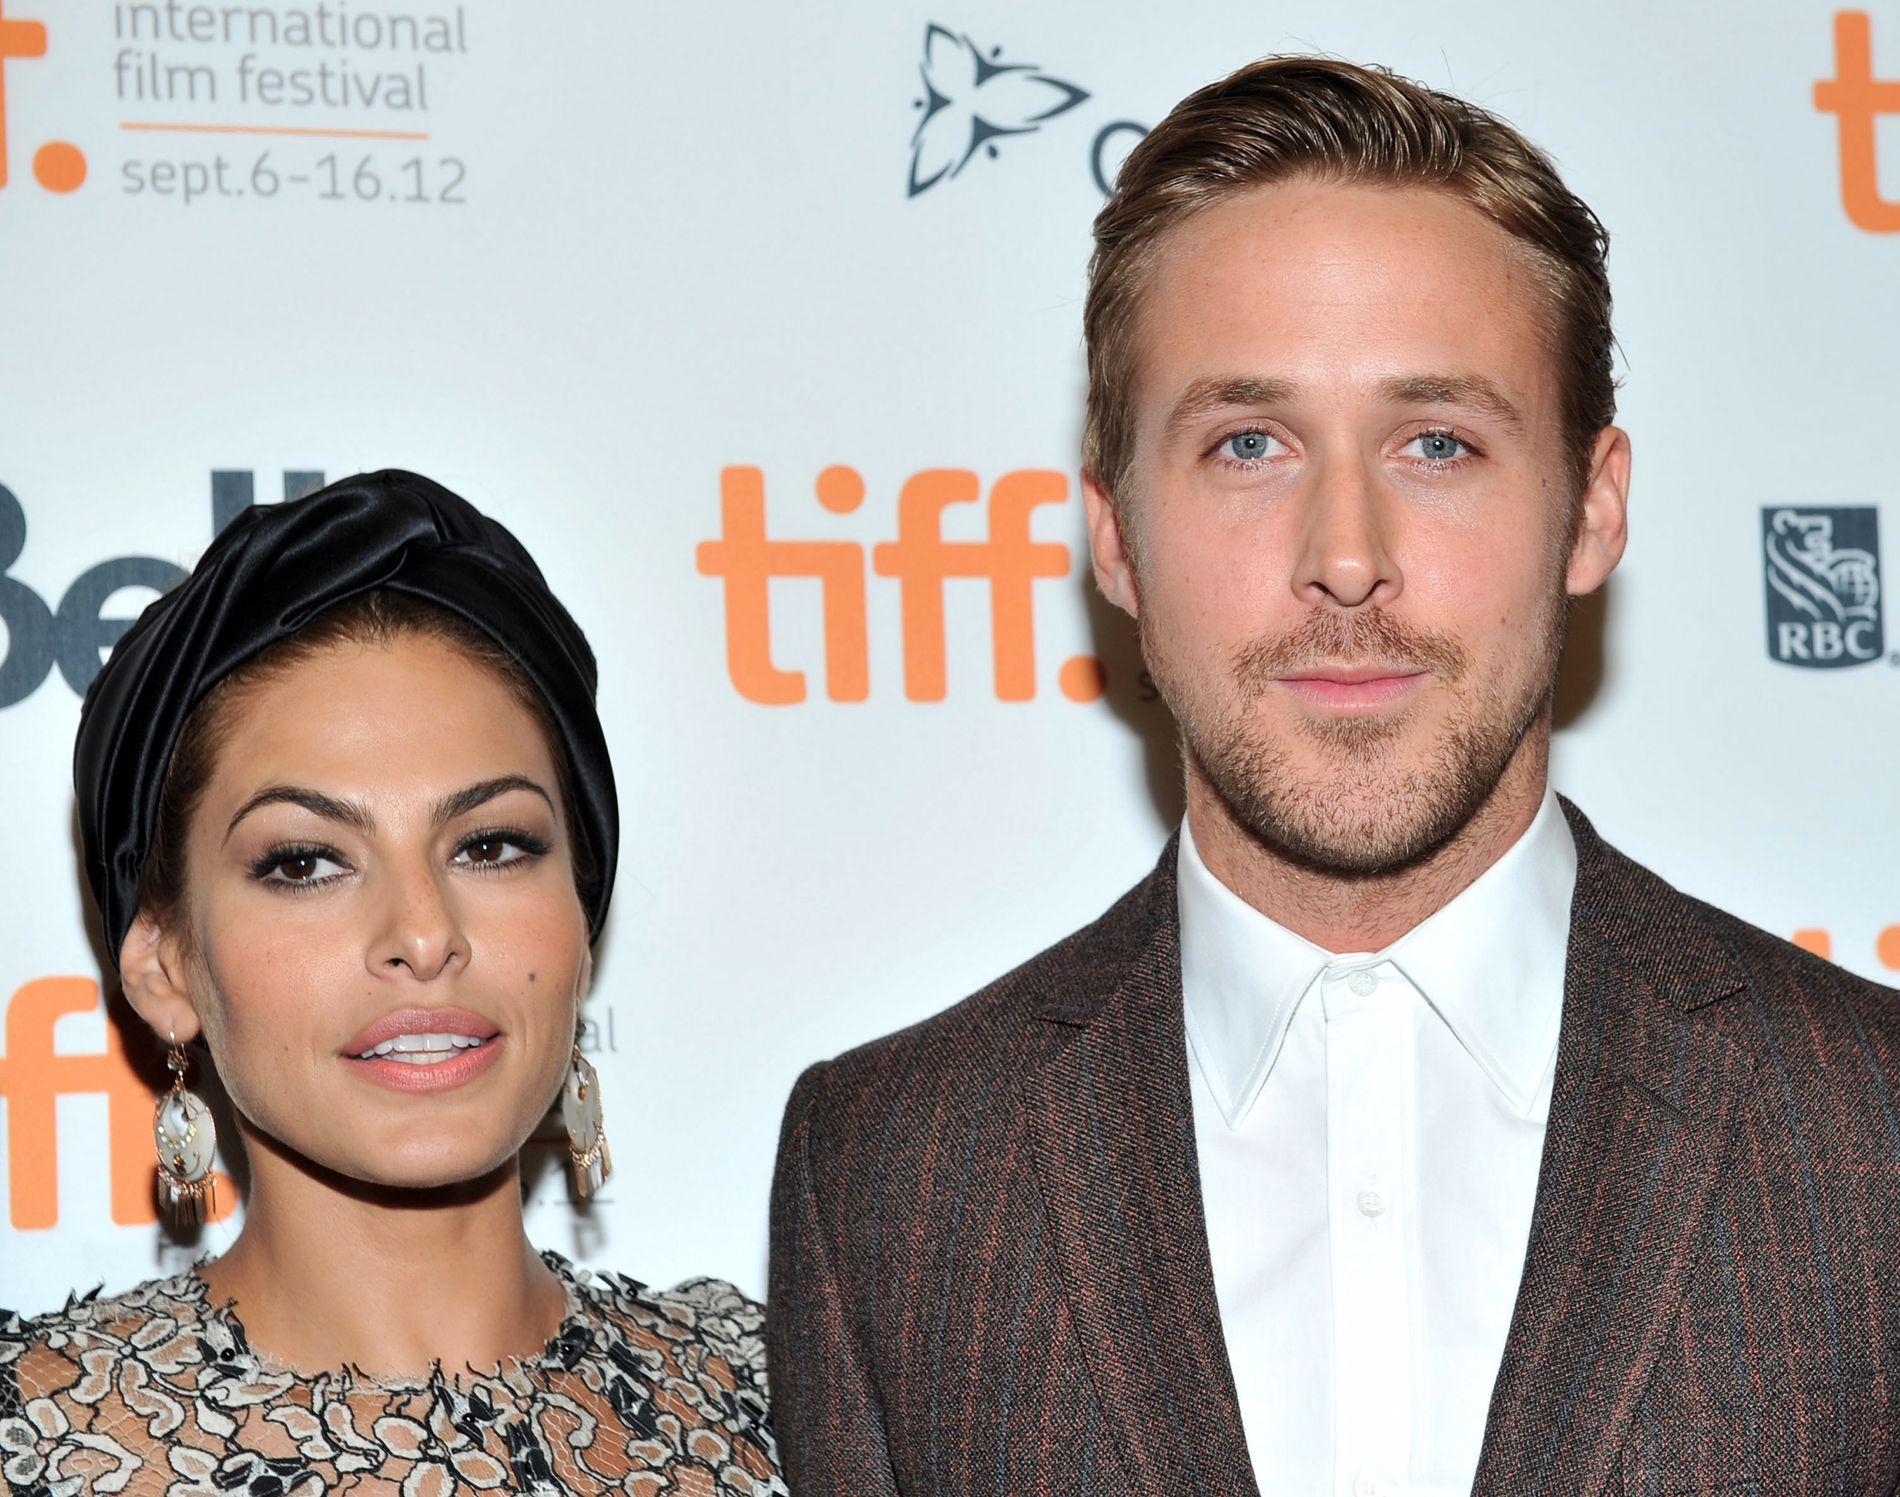 2012: Eva Mendes og Ryan Gosling på premieren til «The Place Beyond The Pines» i Toronto for snart fem år siden.